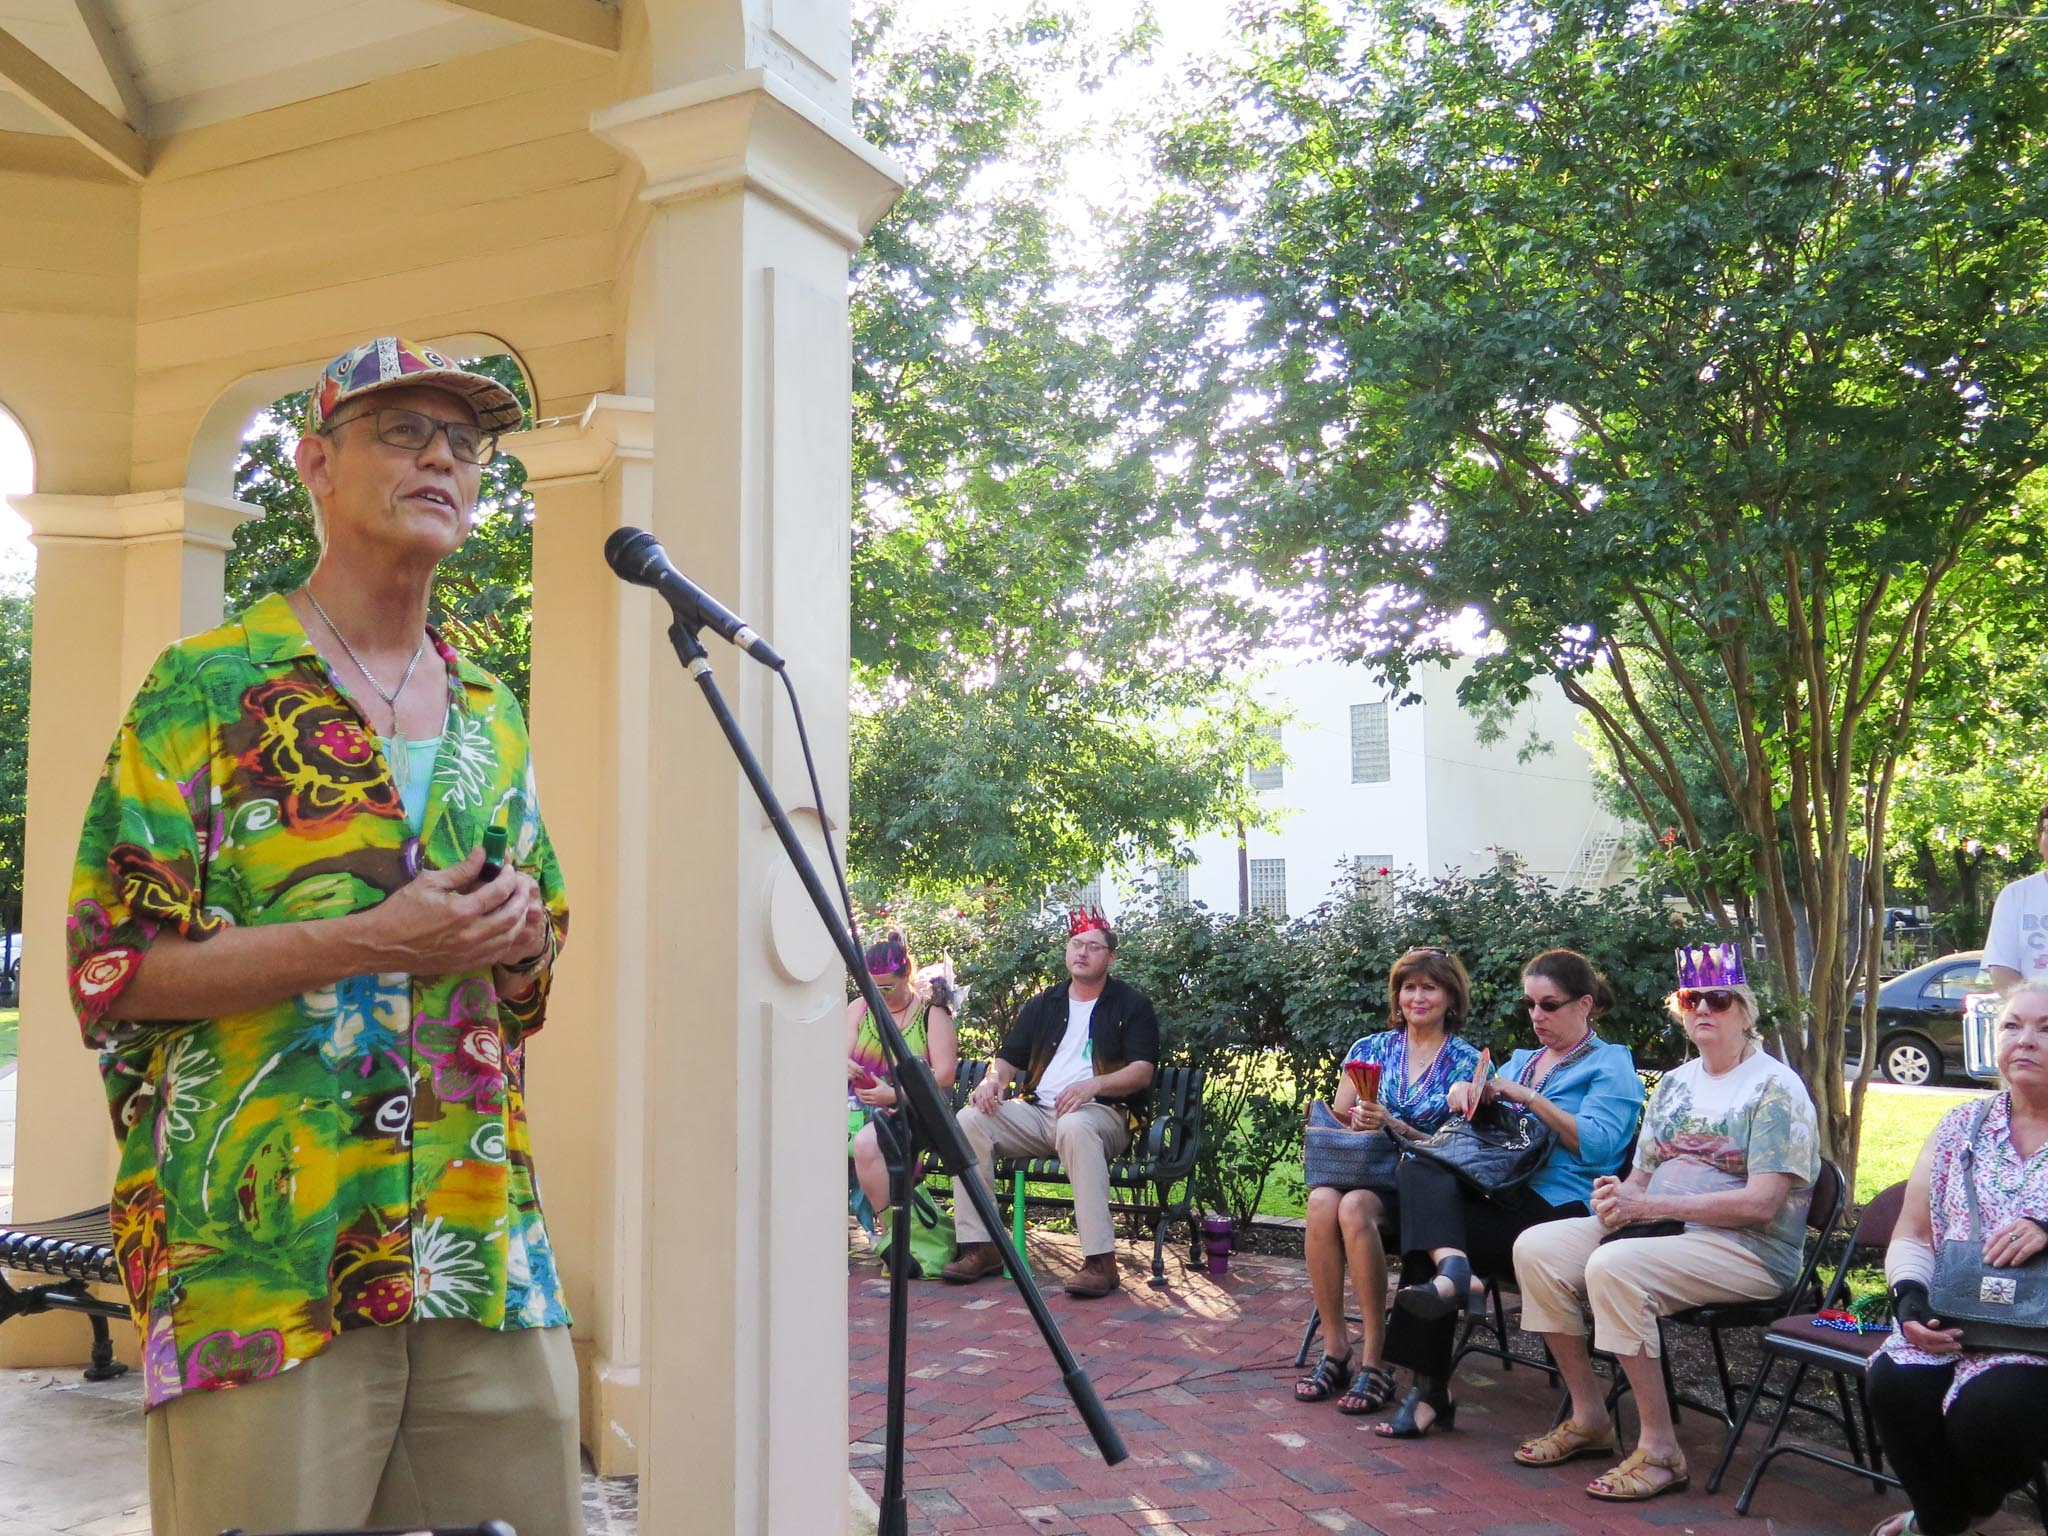 Friend of Sue Duffy, Rudi Harst, talks about Duffy's upbringing.